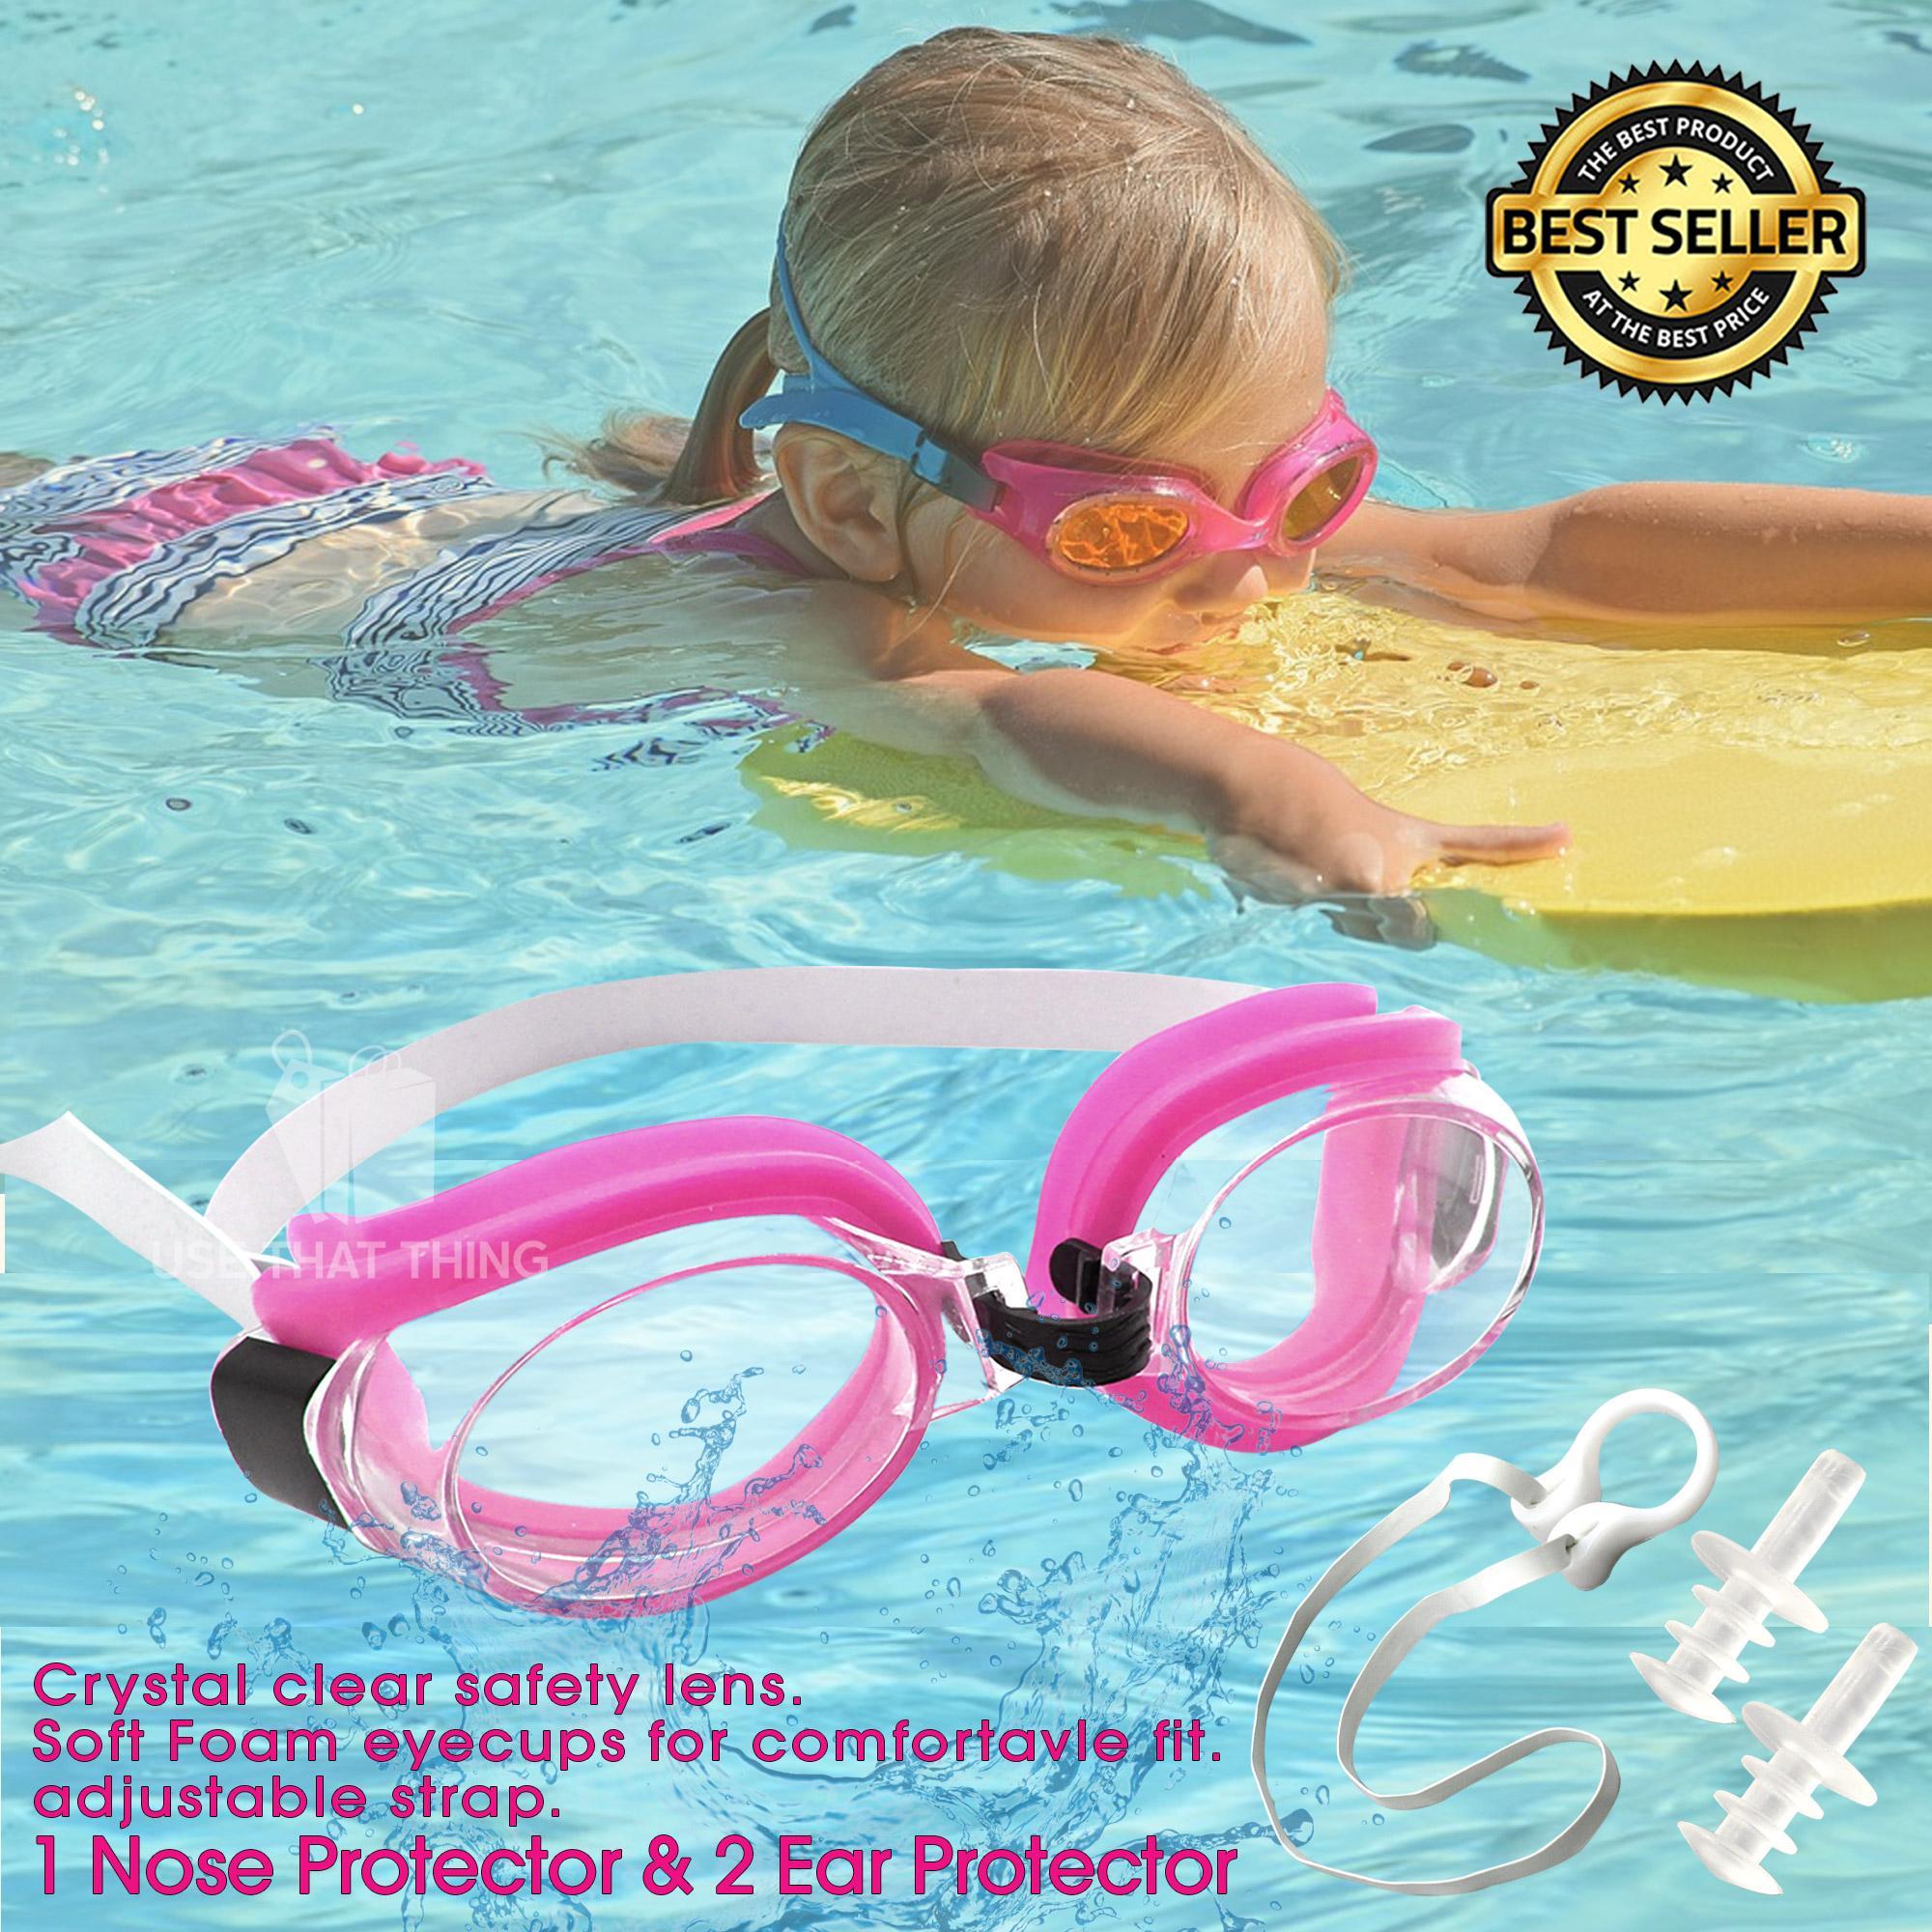 b2cc9bd27f3d Swimming Goggles Waterproof Anti Fog Anti UV Soft Framework Swim Glasses  for kids and Adult